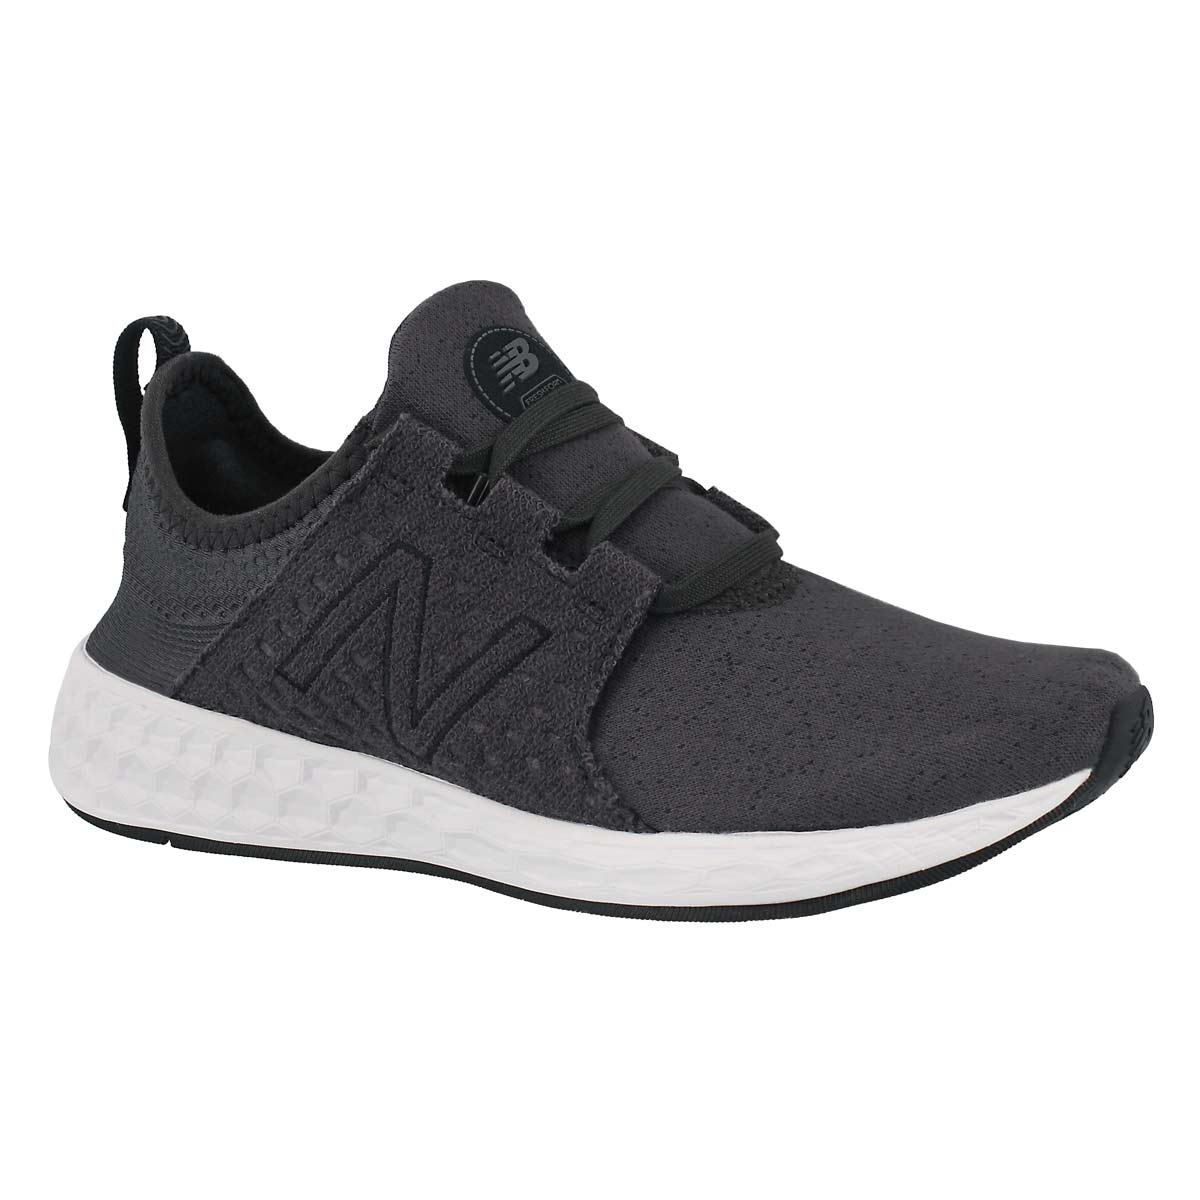 Women's CRUZ black/phantom slip-on sneakers